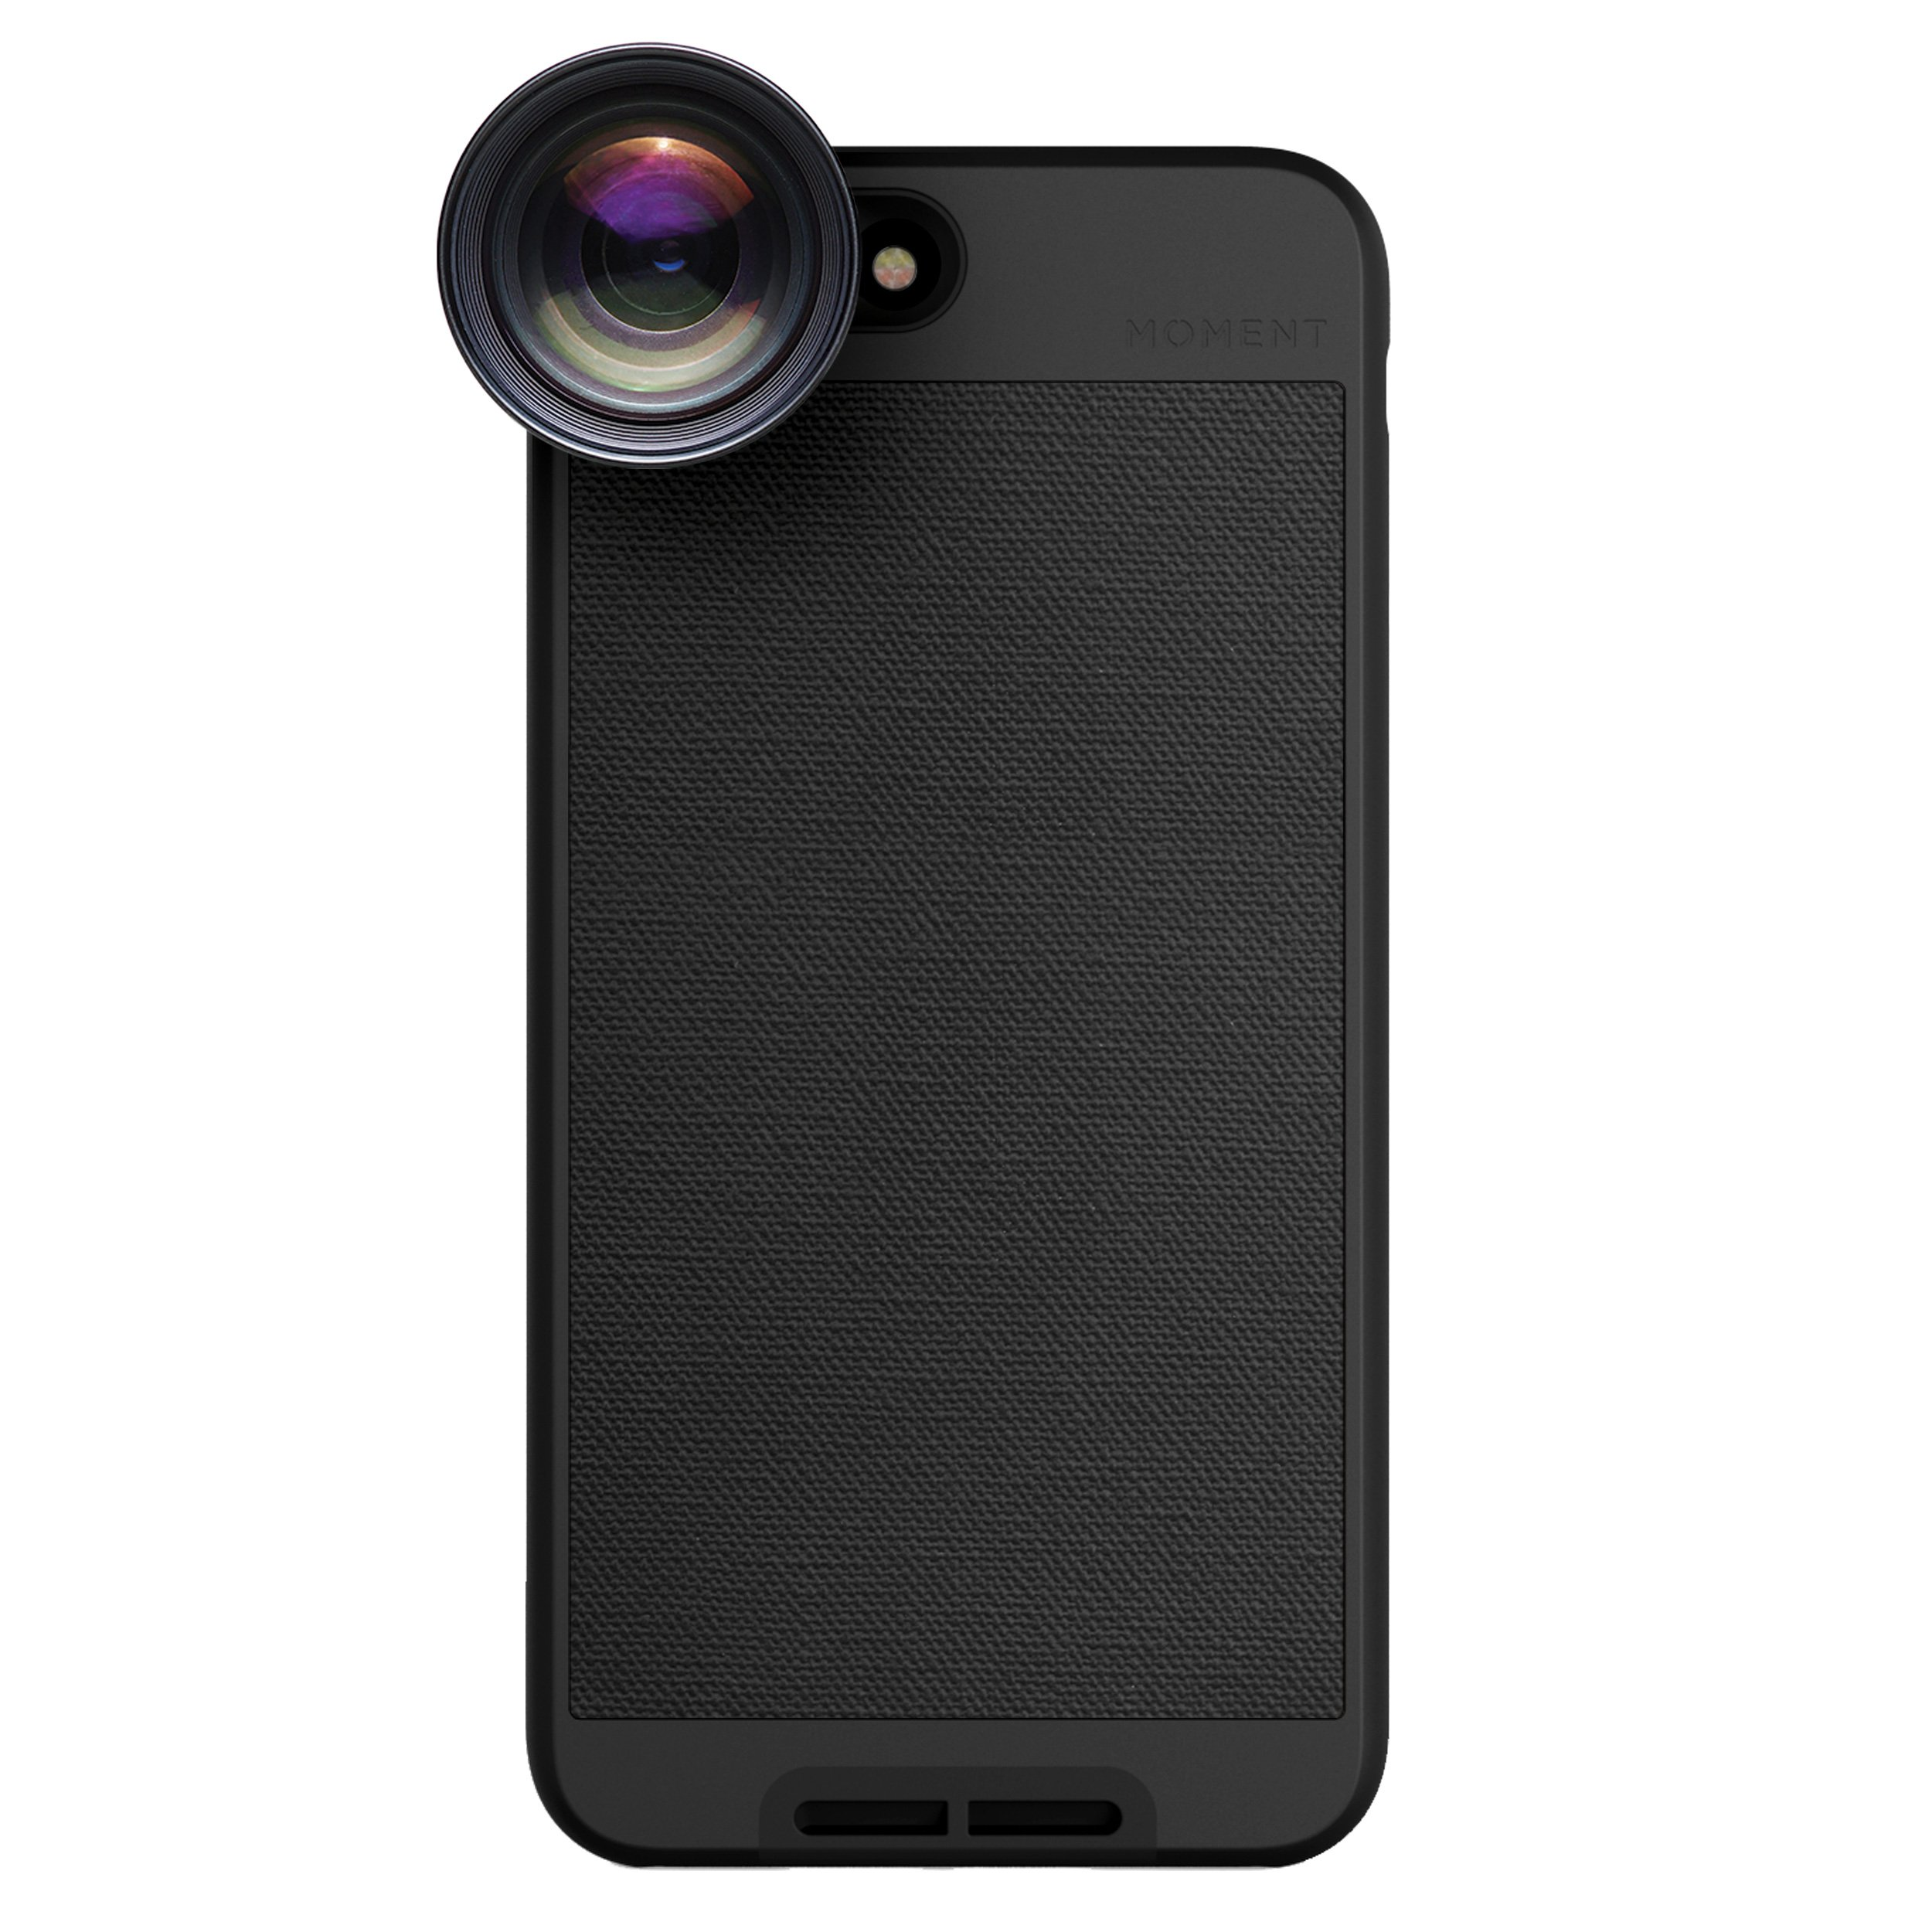 iPhone 8 Plus / iPhone 7 Plus Case with Telephoto Lens Kit || Moment Black Canvas Photo Case plus Tele Lens || Best iphone zoom attachment lens with thin protective case.